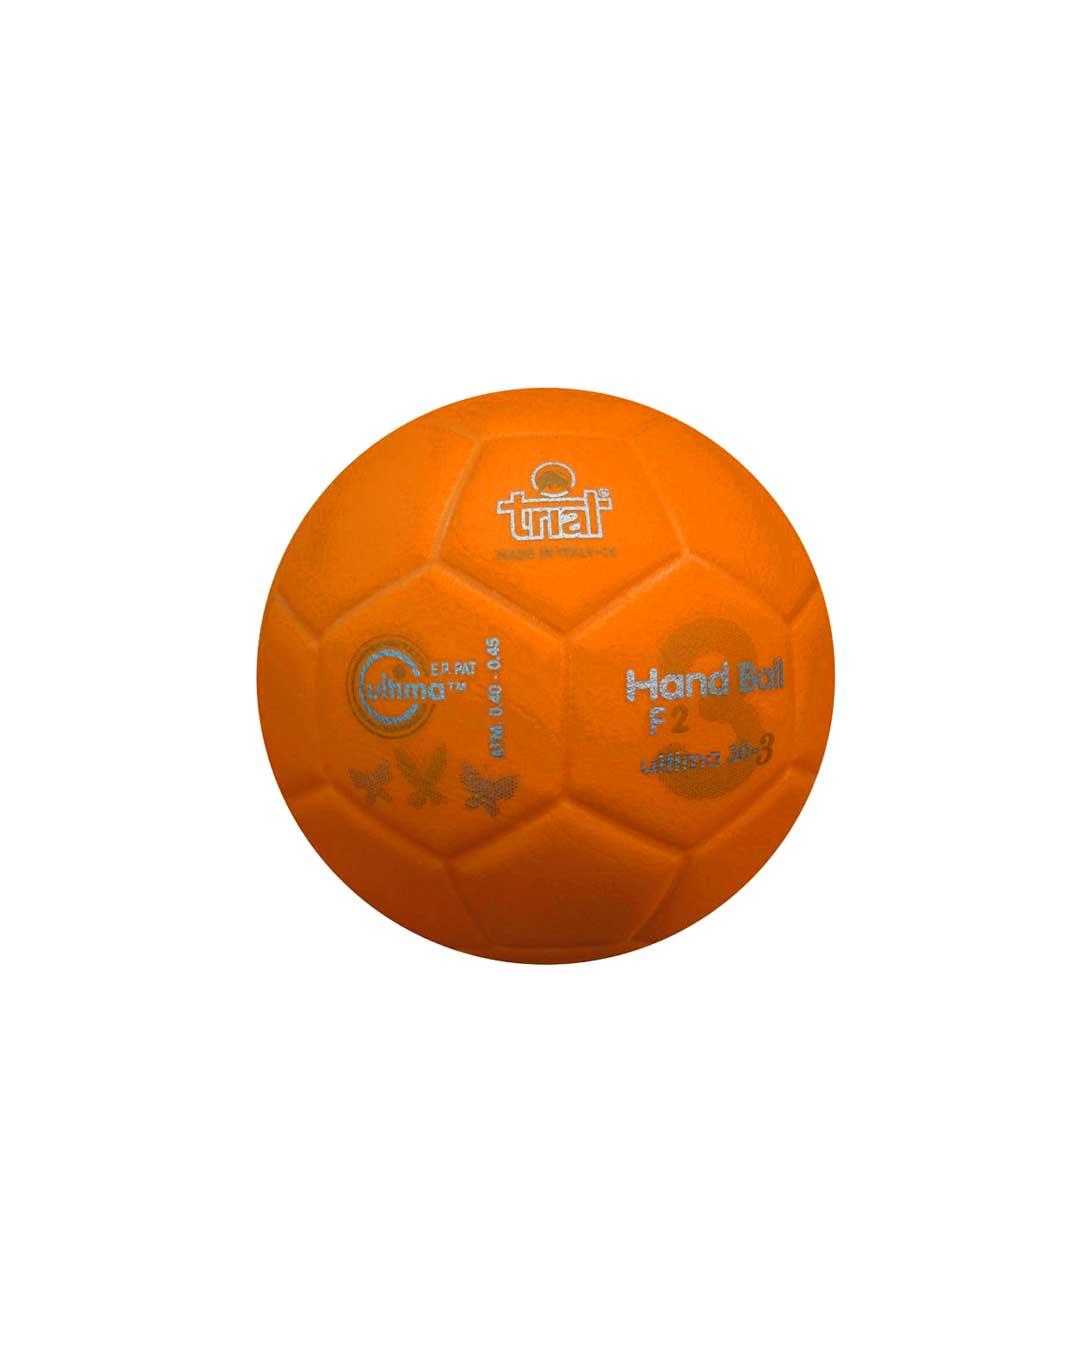 Balón de Handball Marca Trial Modelo Ultima 30-3 N° 2 naranja